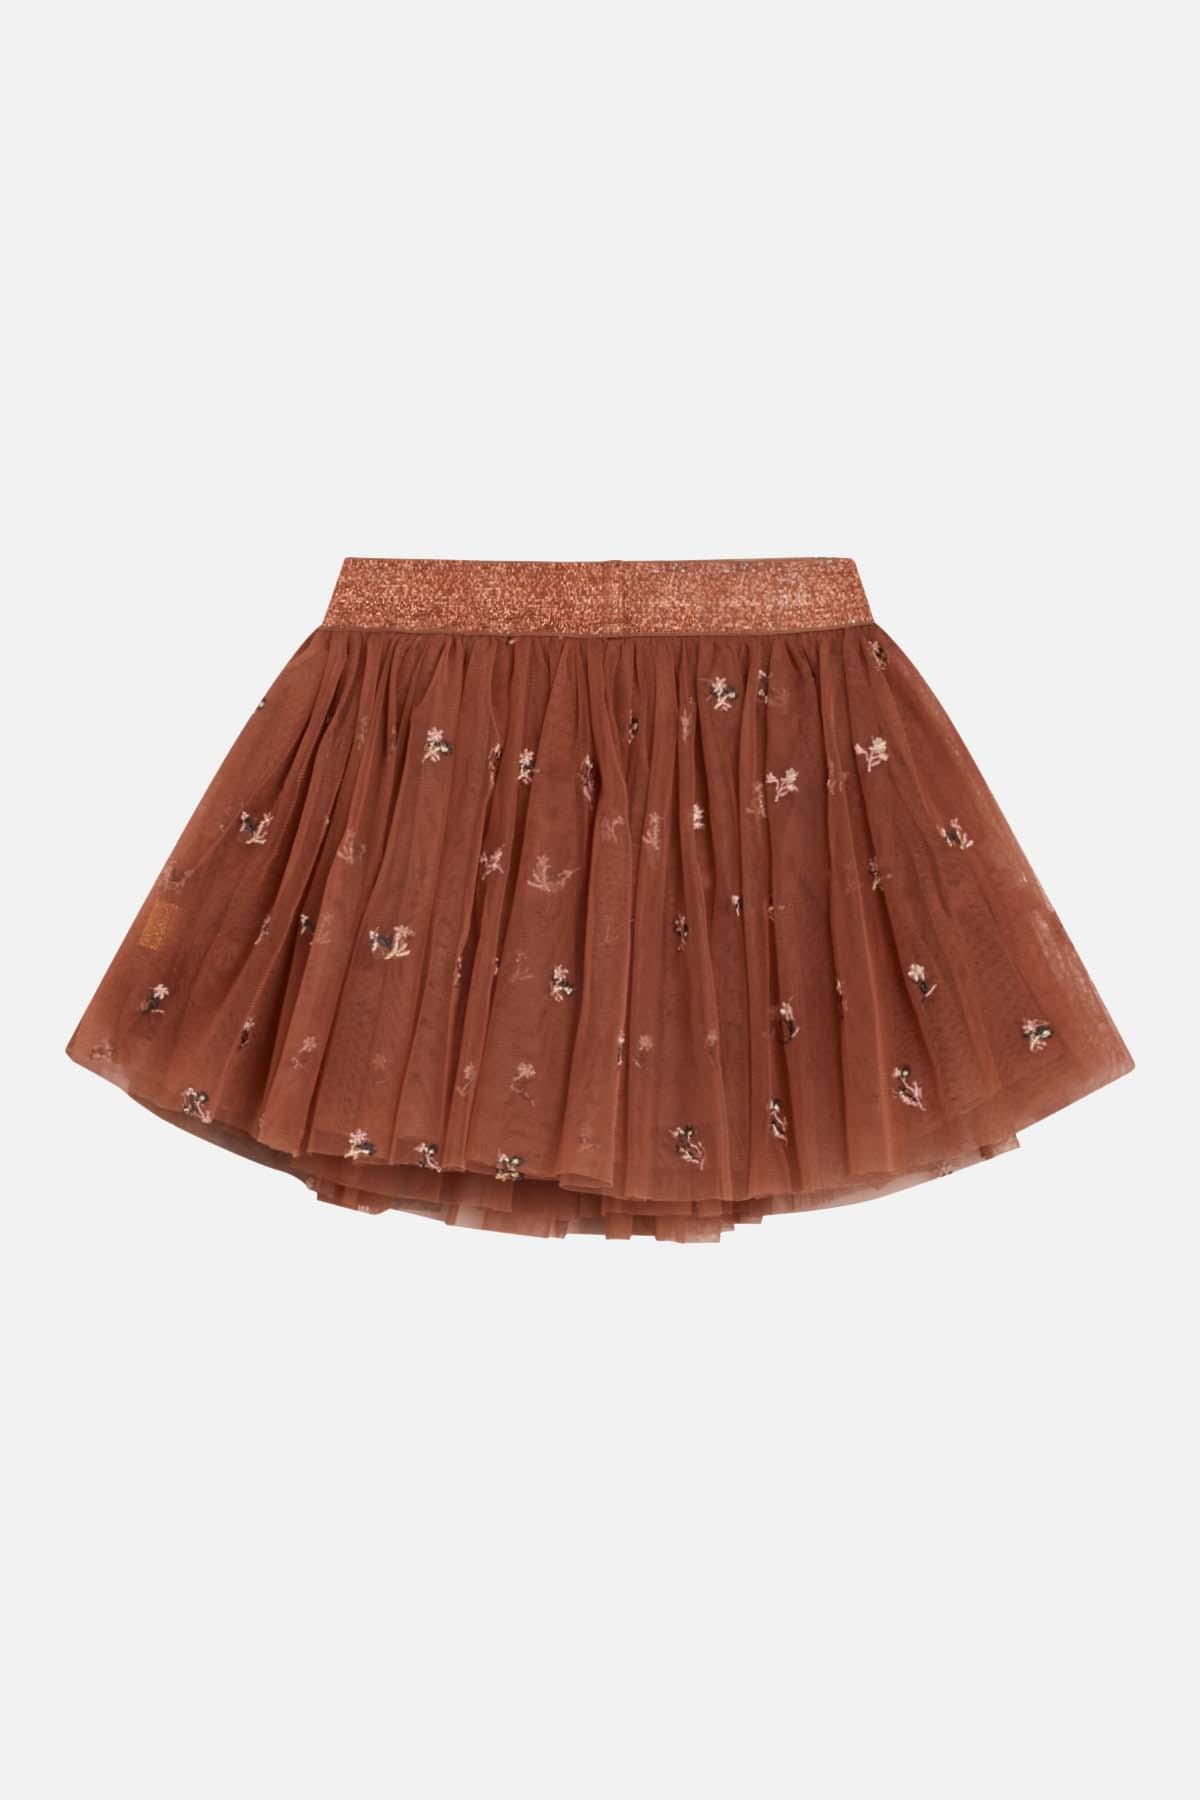 Hust & Claire Naina nederdel, carob, 98